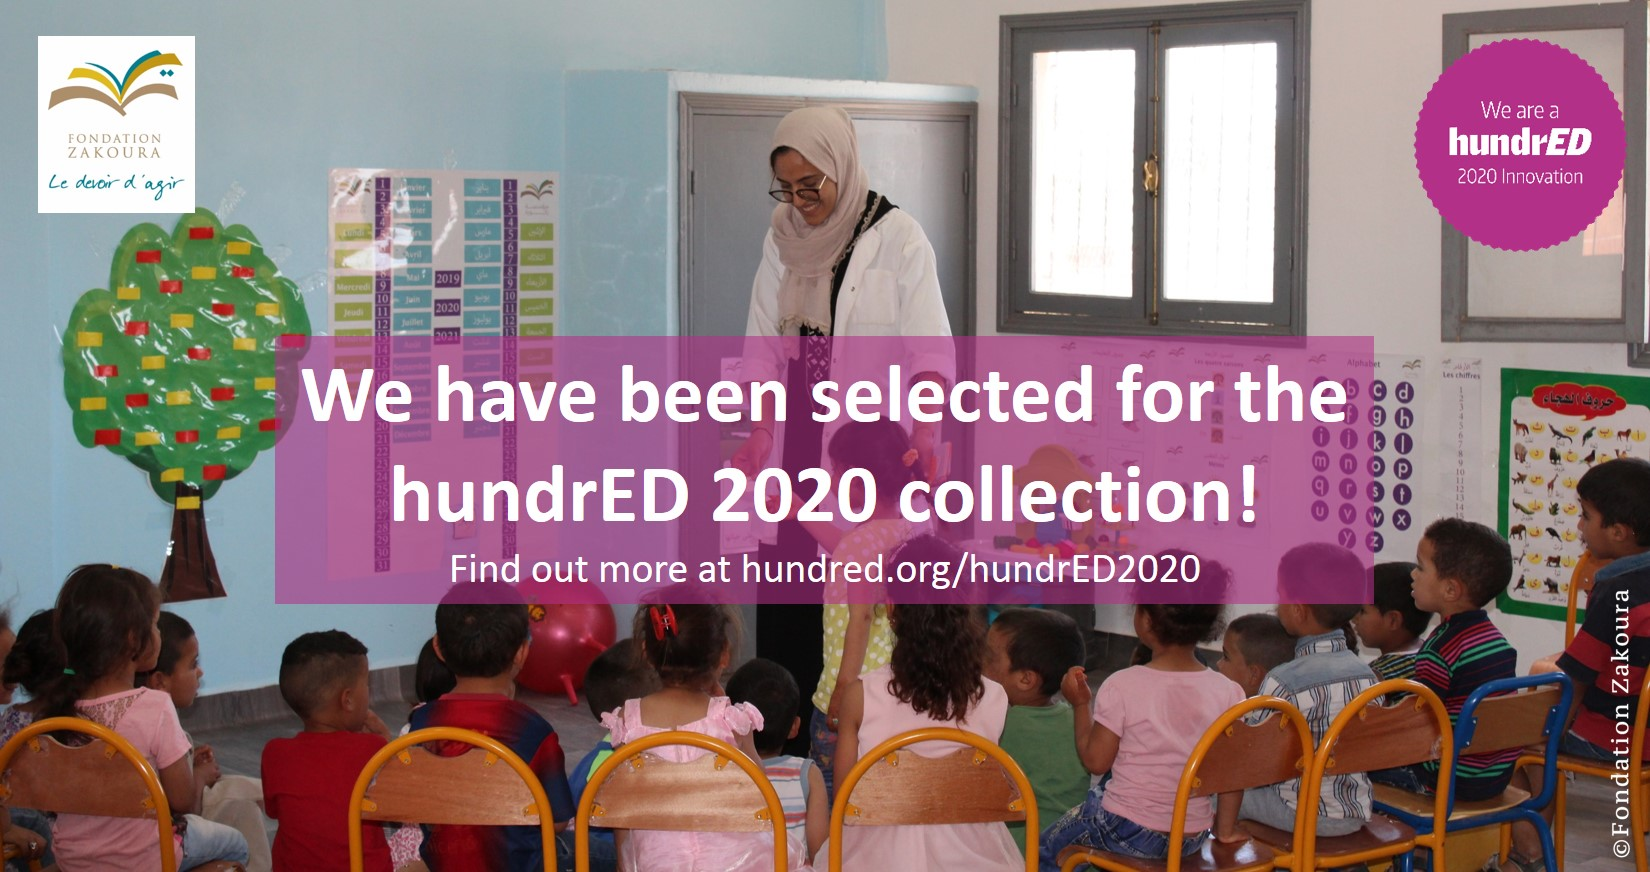 HundrED - Nouvelle distinction internationale pour la Fondation Zakoura